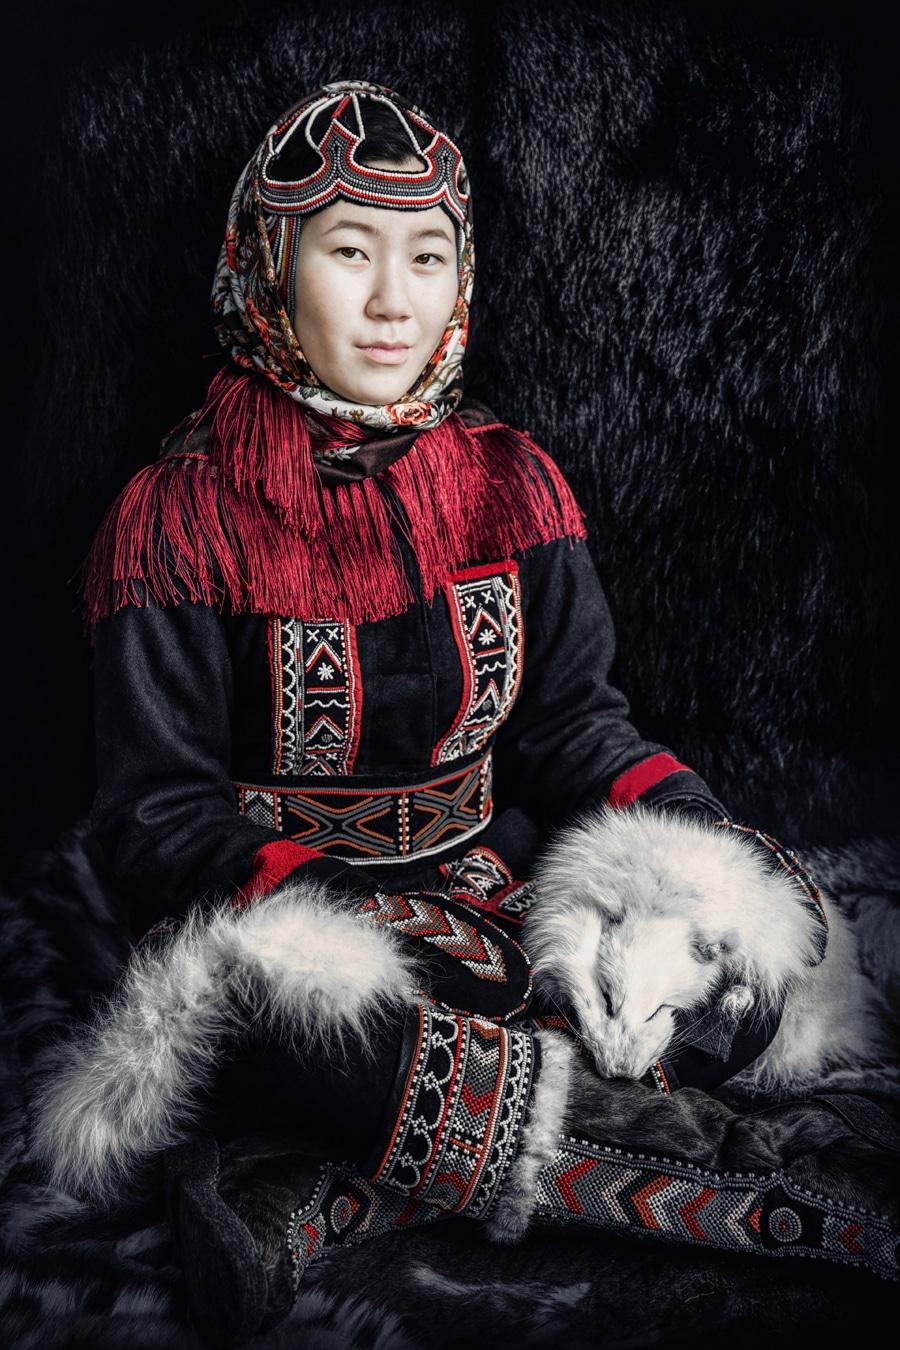 Alexander Khimushin portraits from Siberia